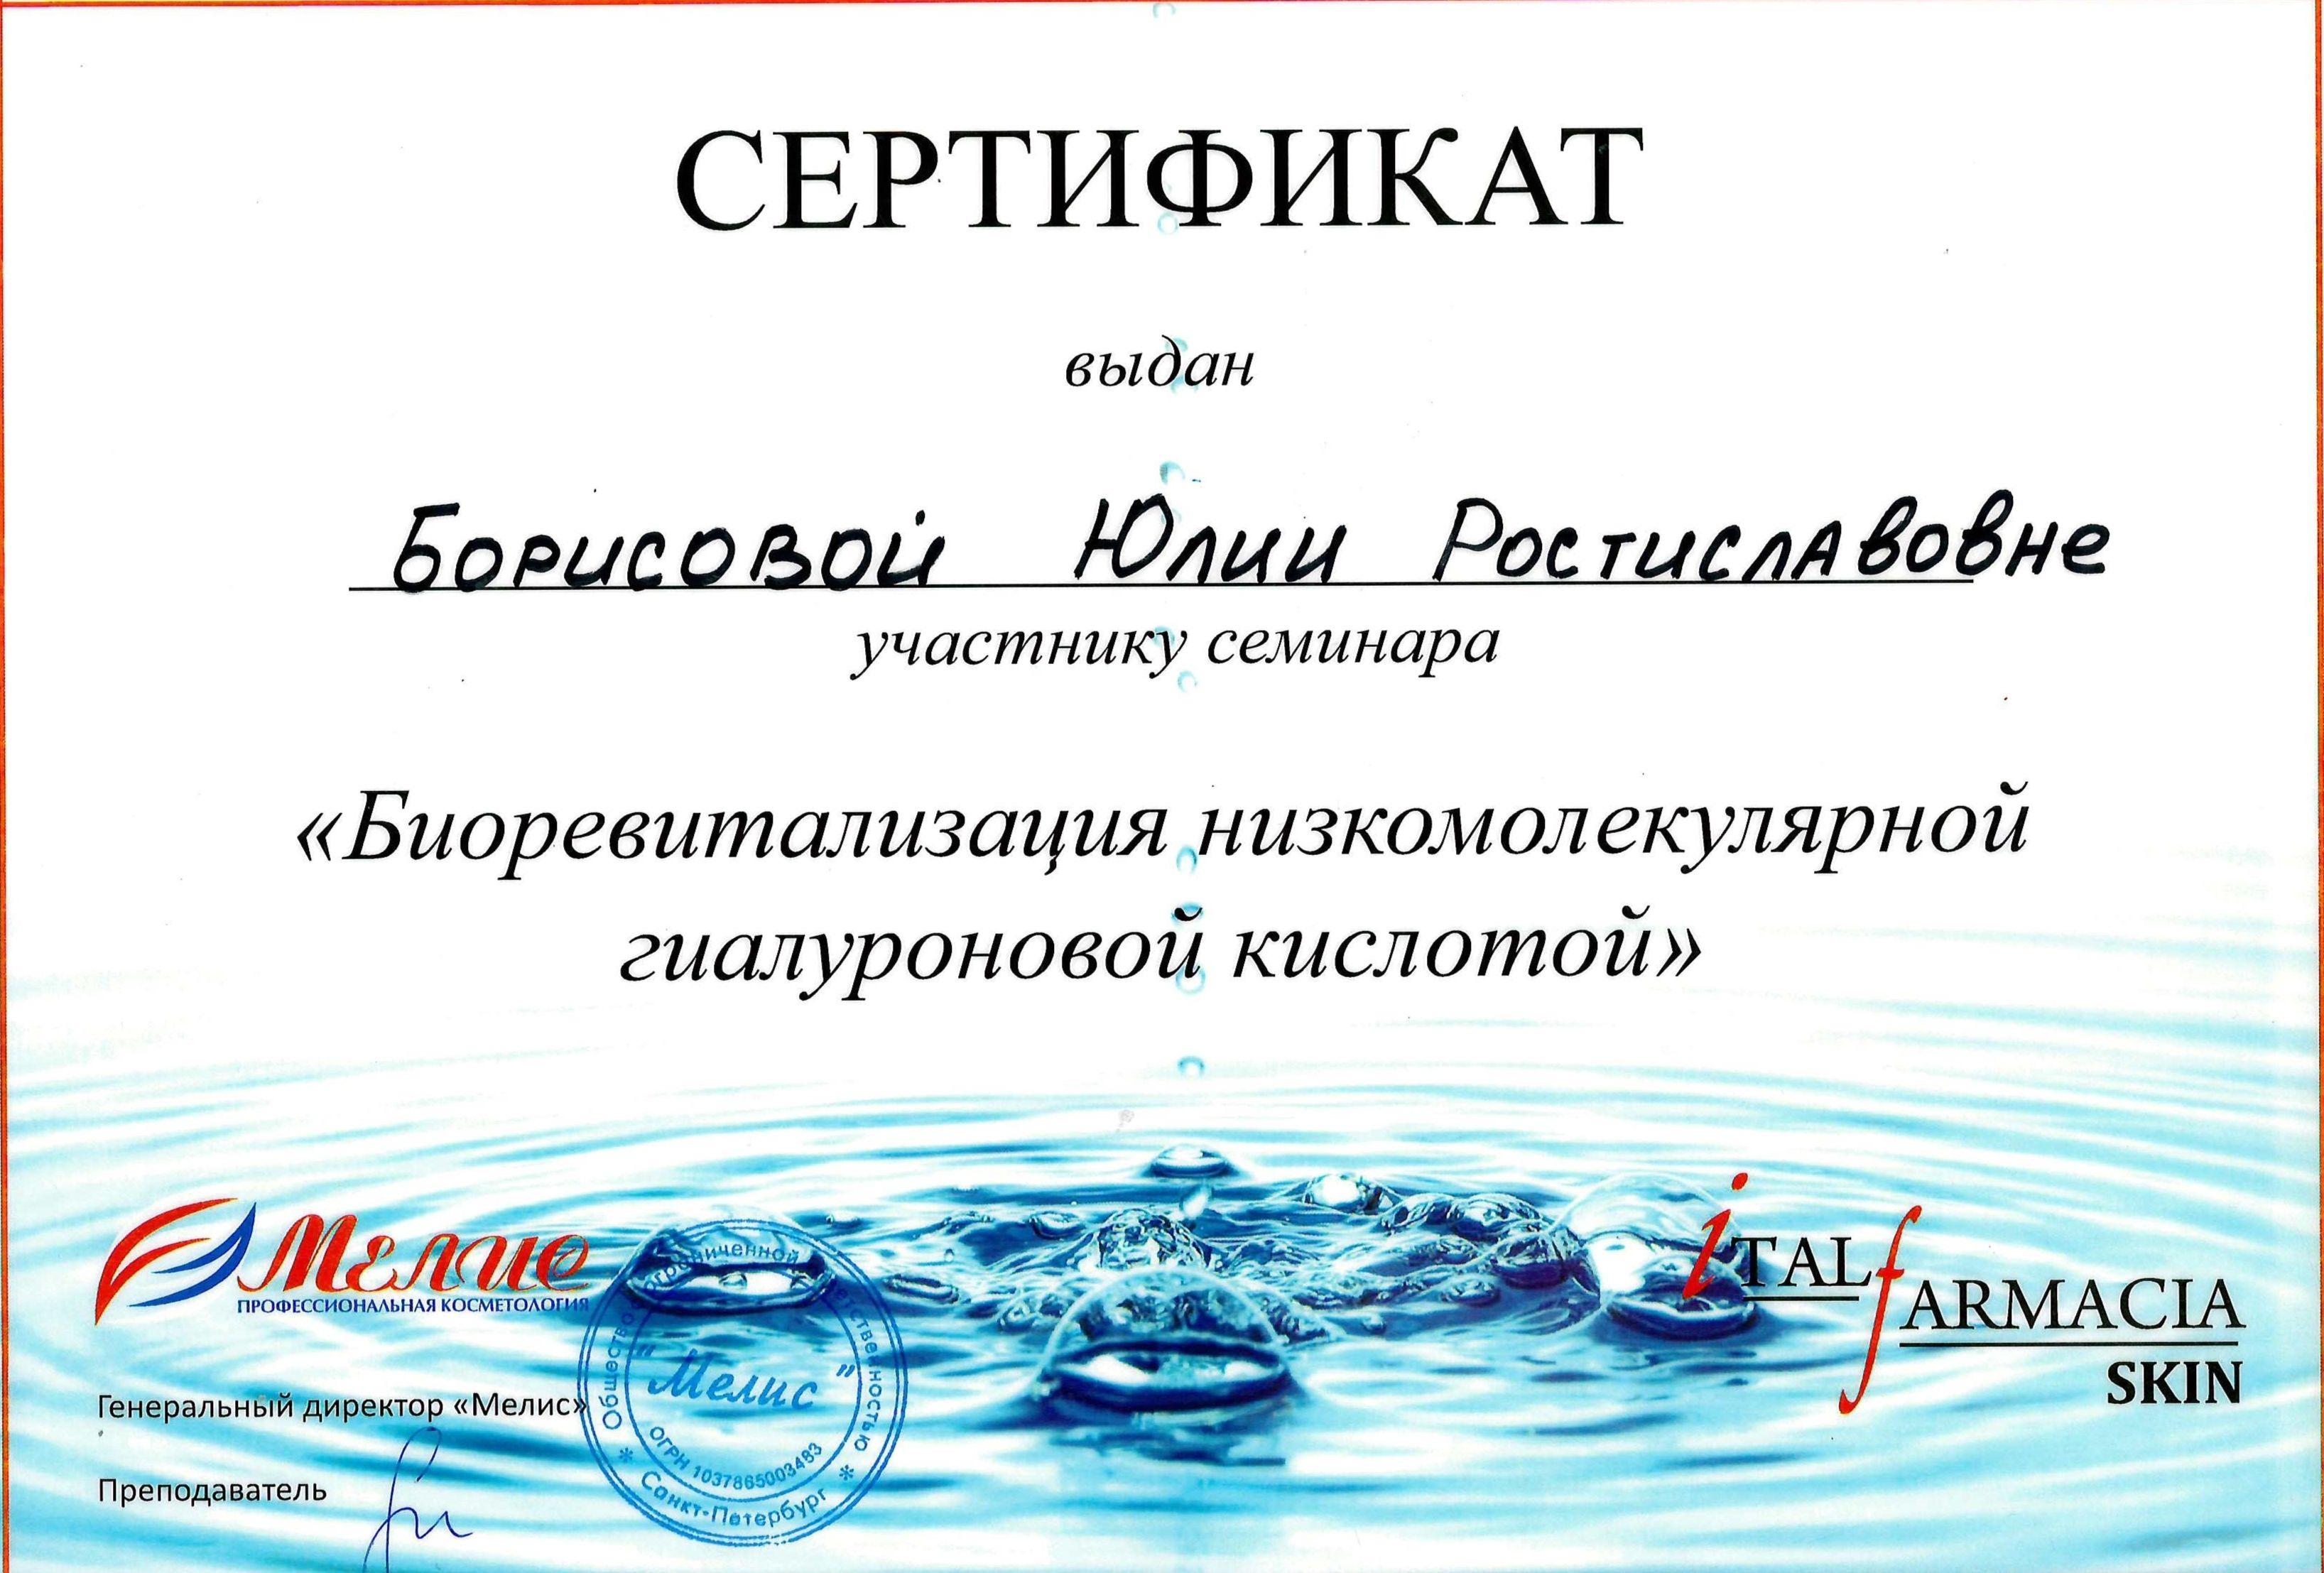 Сертификат — Семинар «Биоревитализация». Григорьева Юлия Ростиславовна